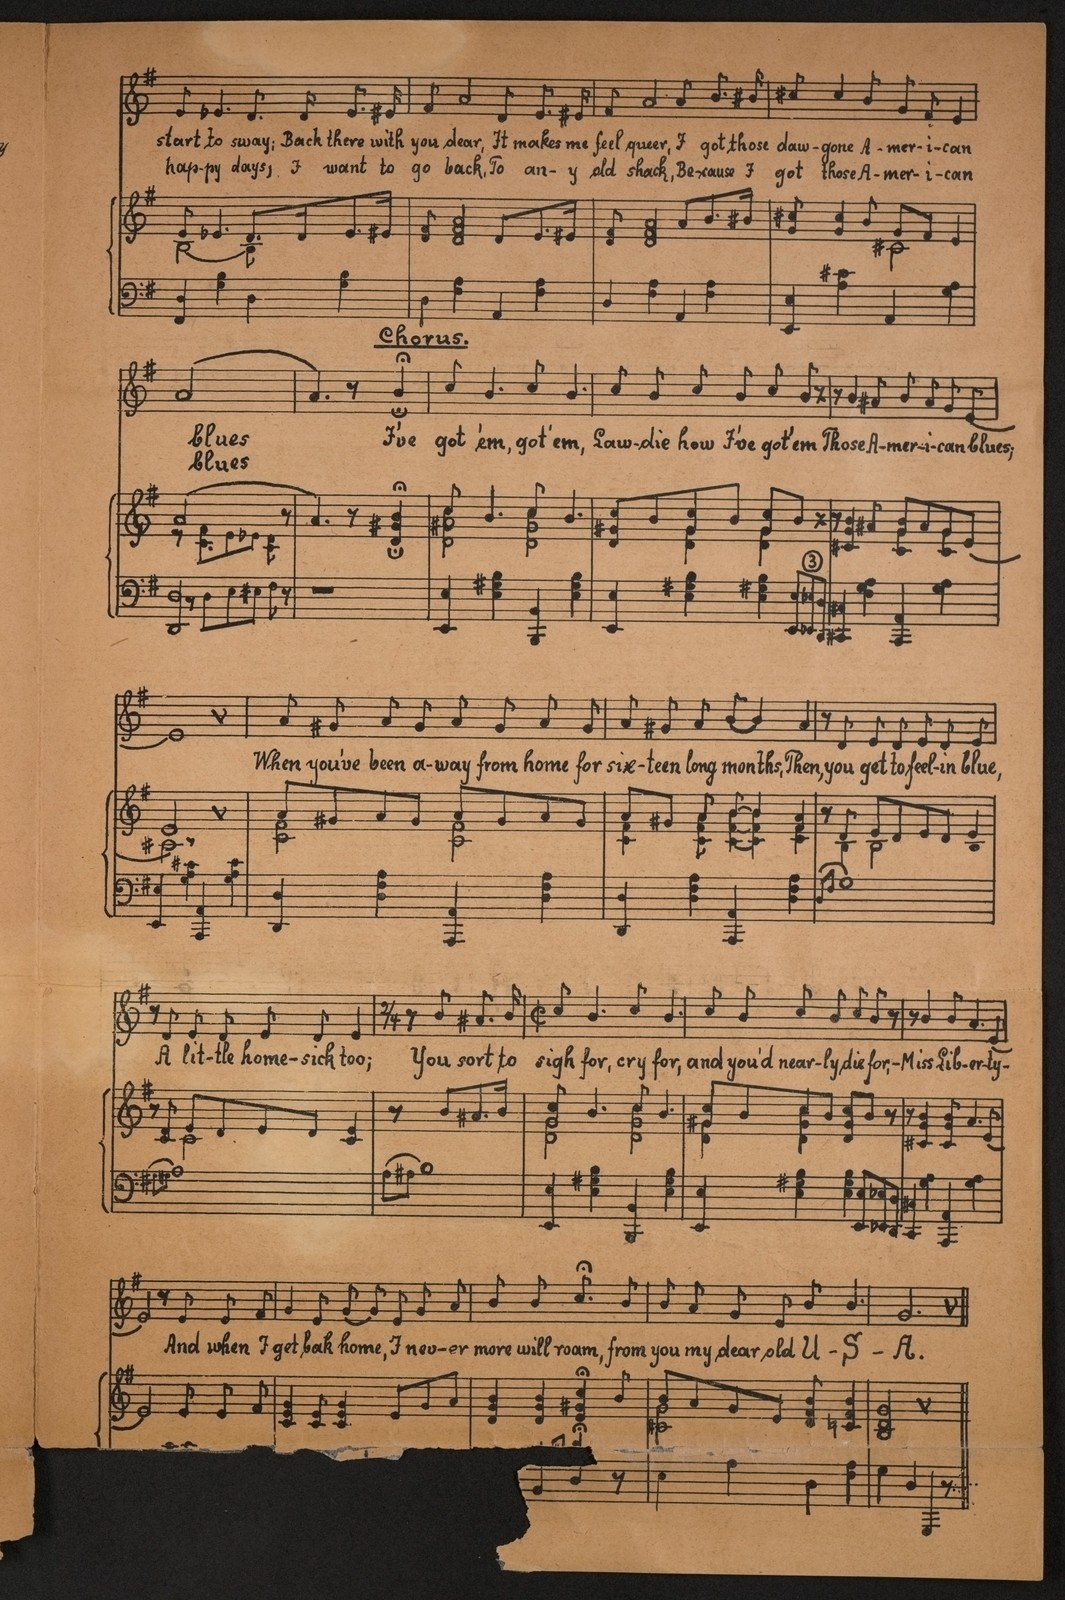 Those American blues - PICRYL Public Domain Image